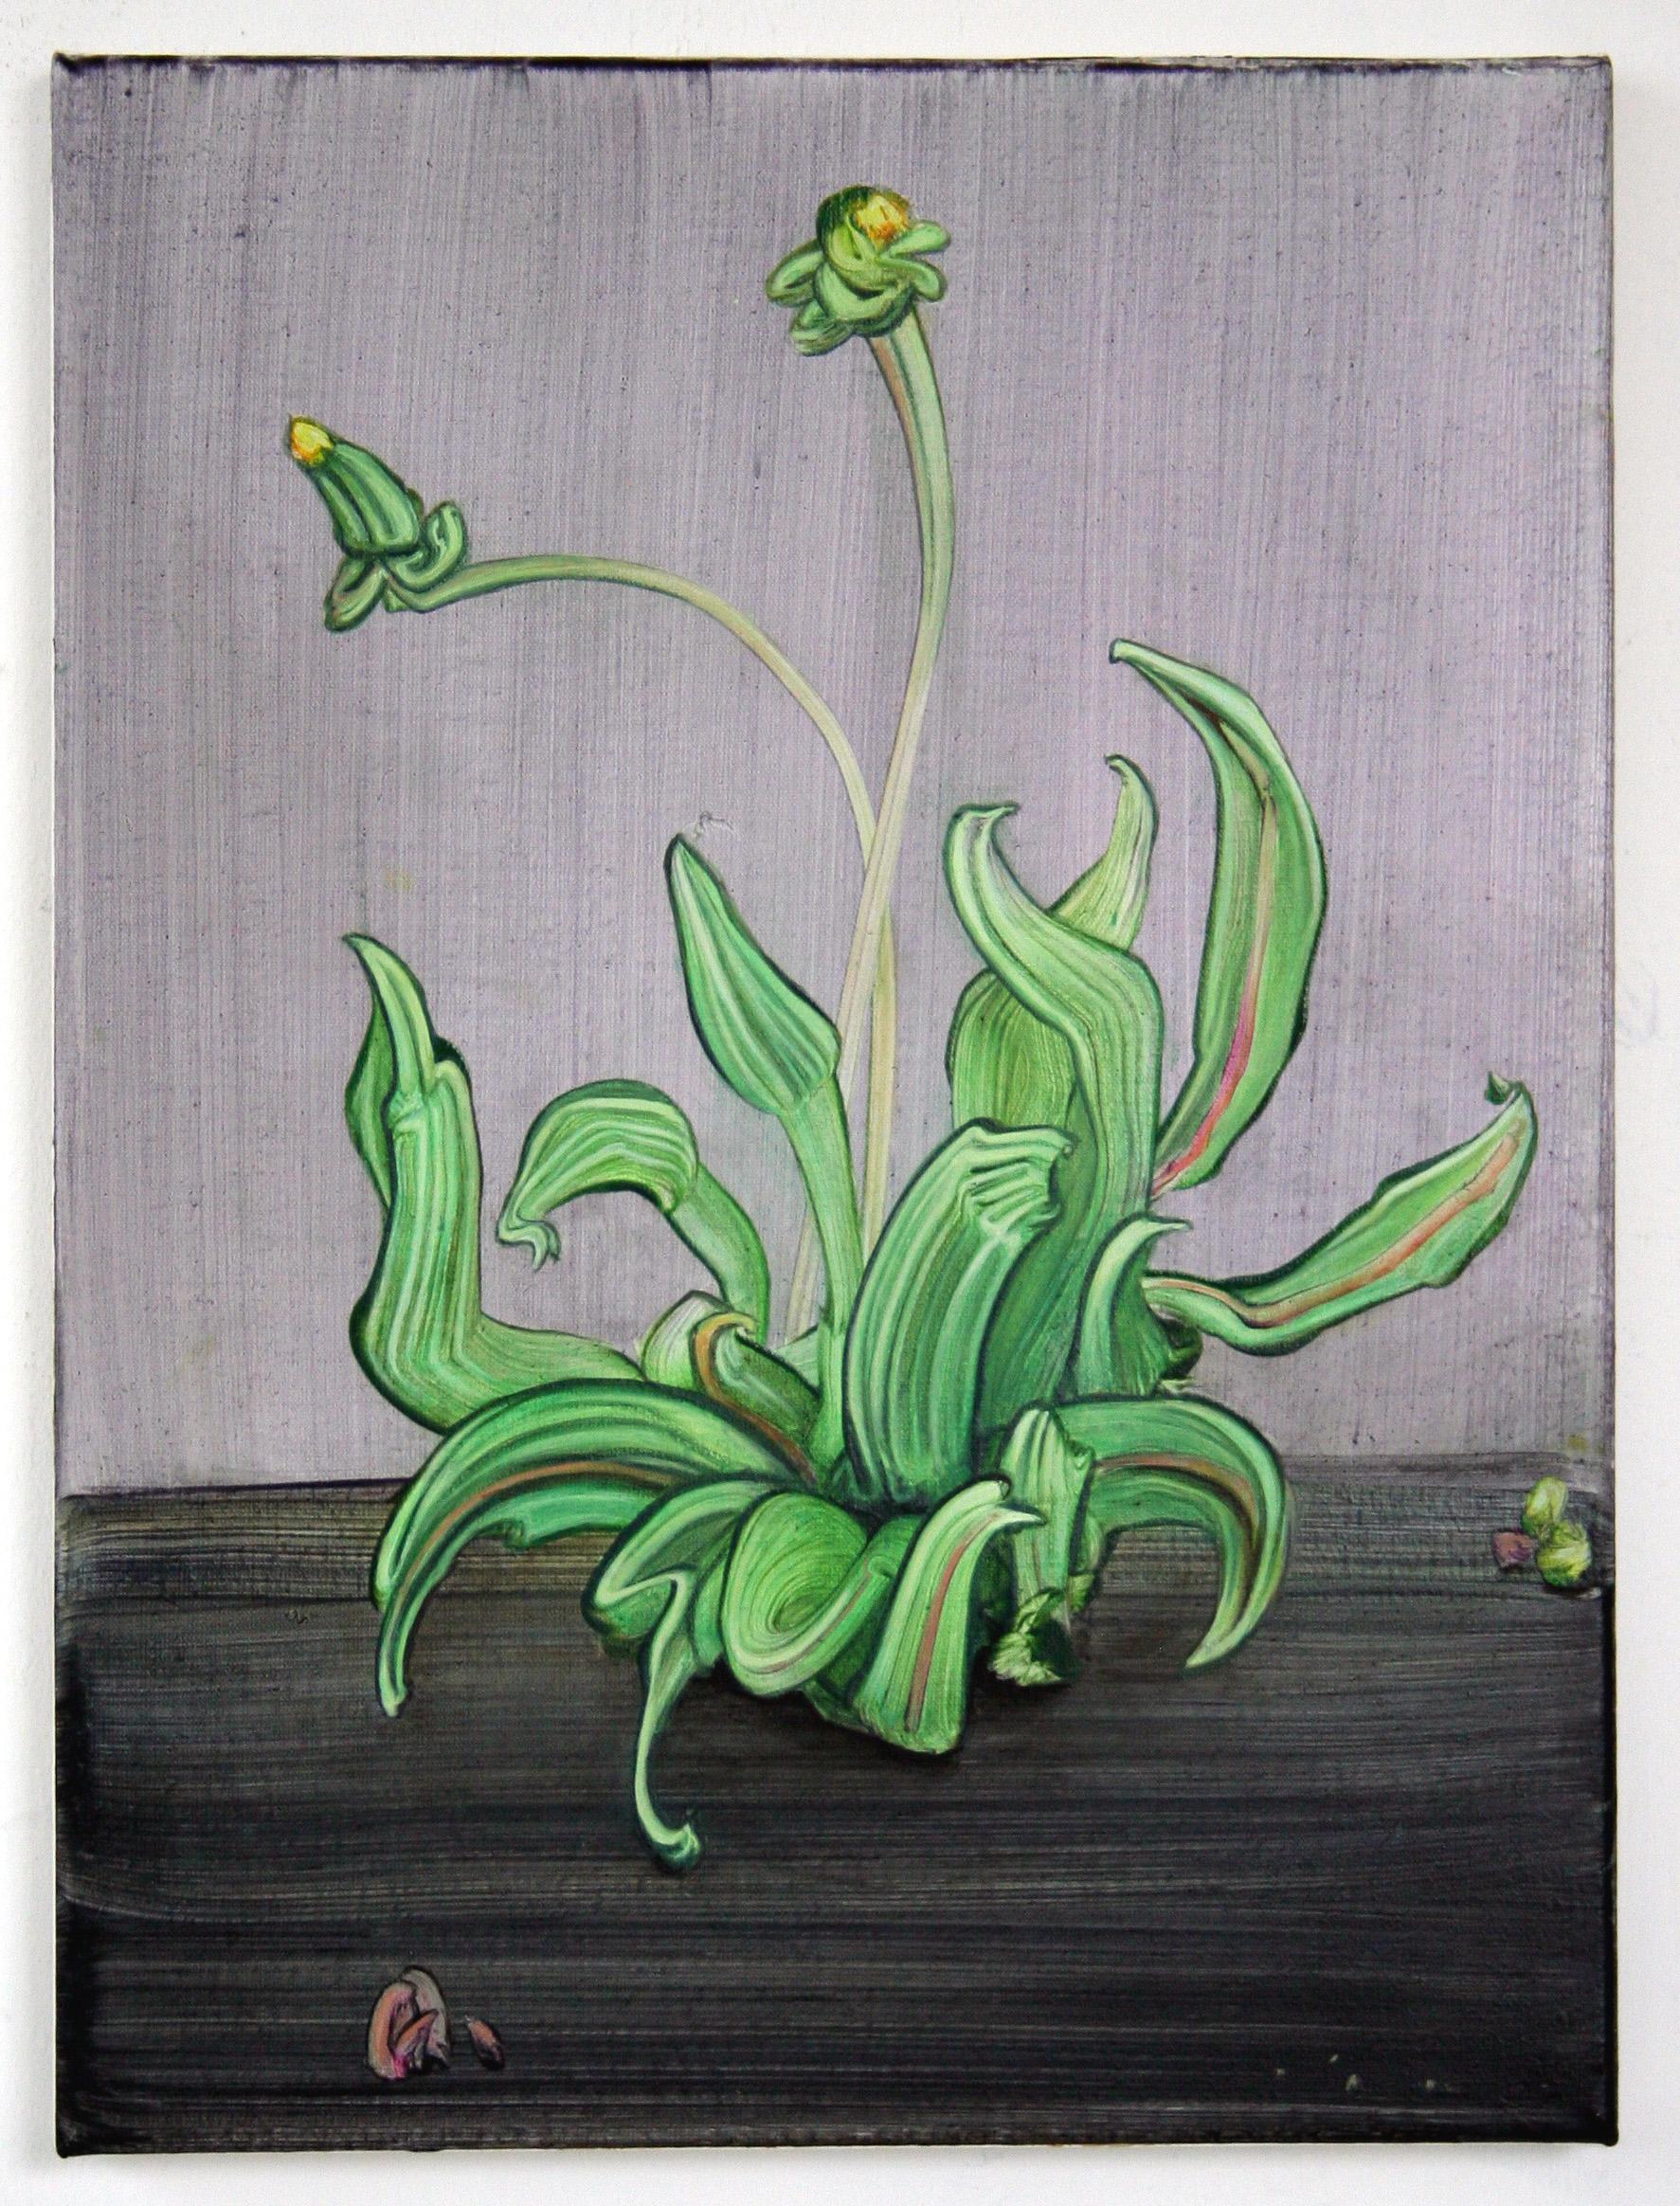 Dandelion, 2015, oil on canvas